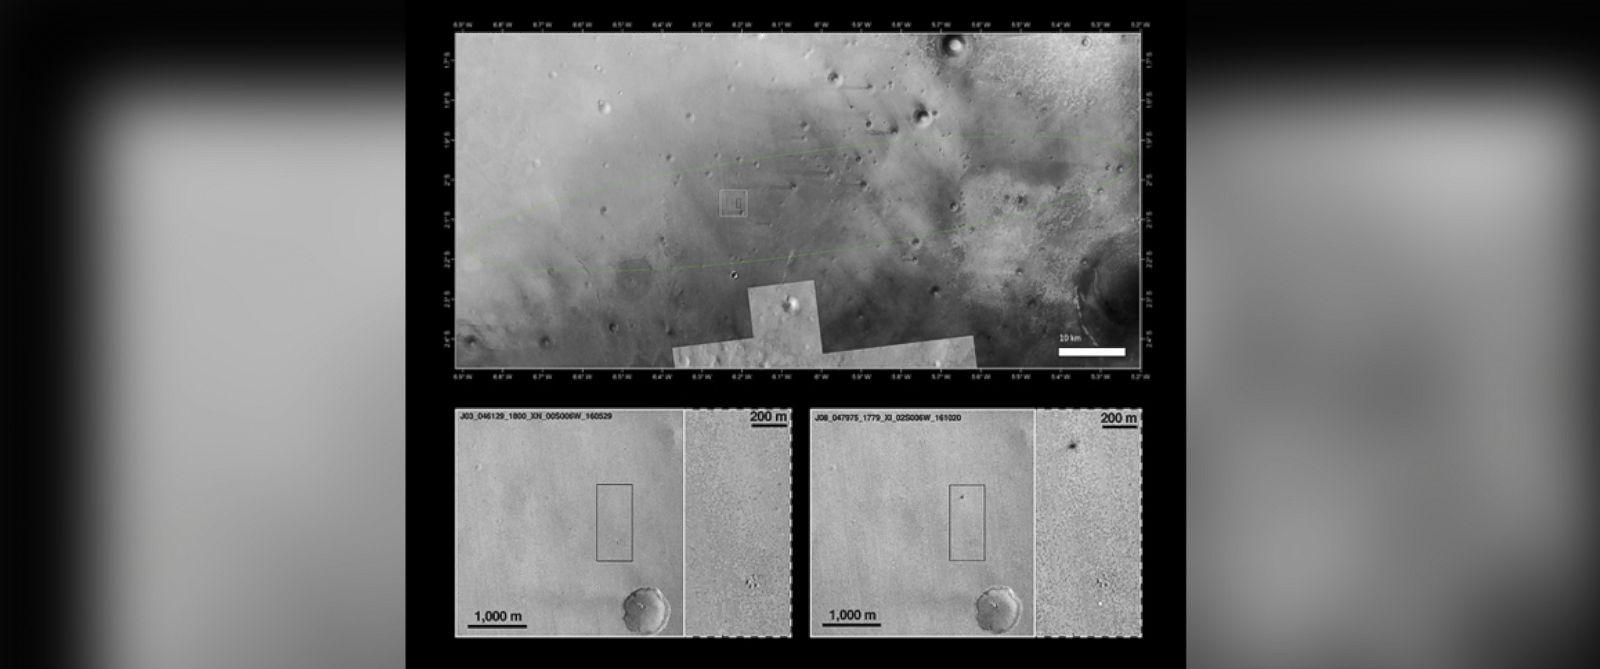 Schiaparelli Probe Likely Crash-Landed on Mars, Photos ...